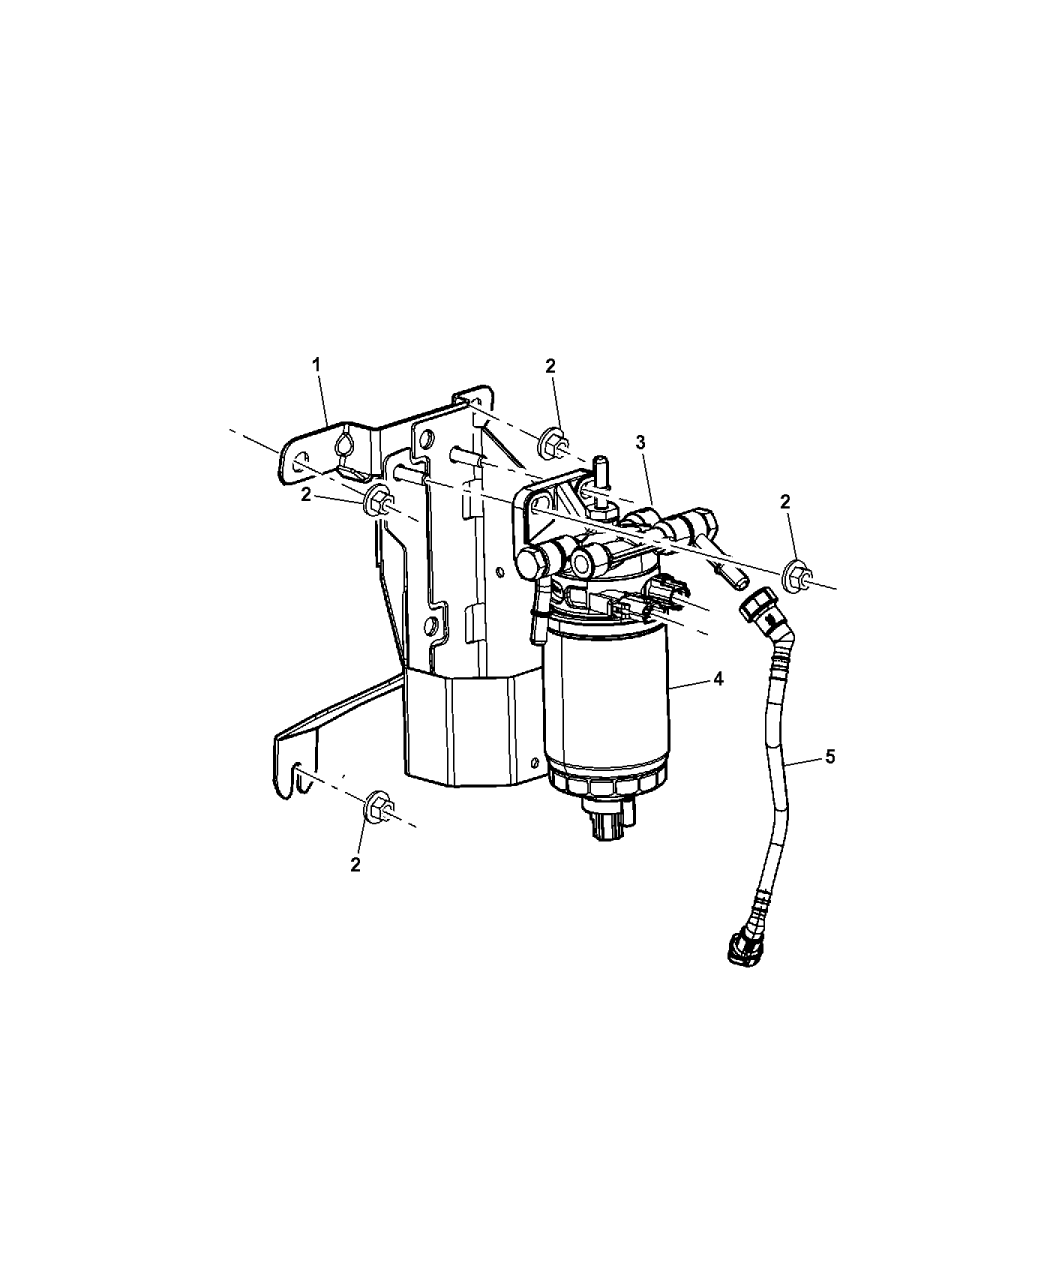 52125498AD  Genuine Mopar BRACKET   FUEL       FILTER